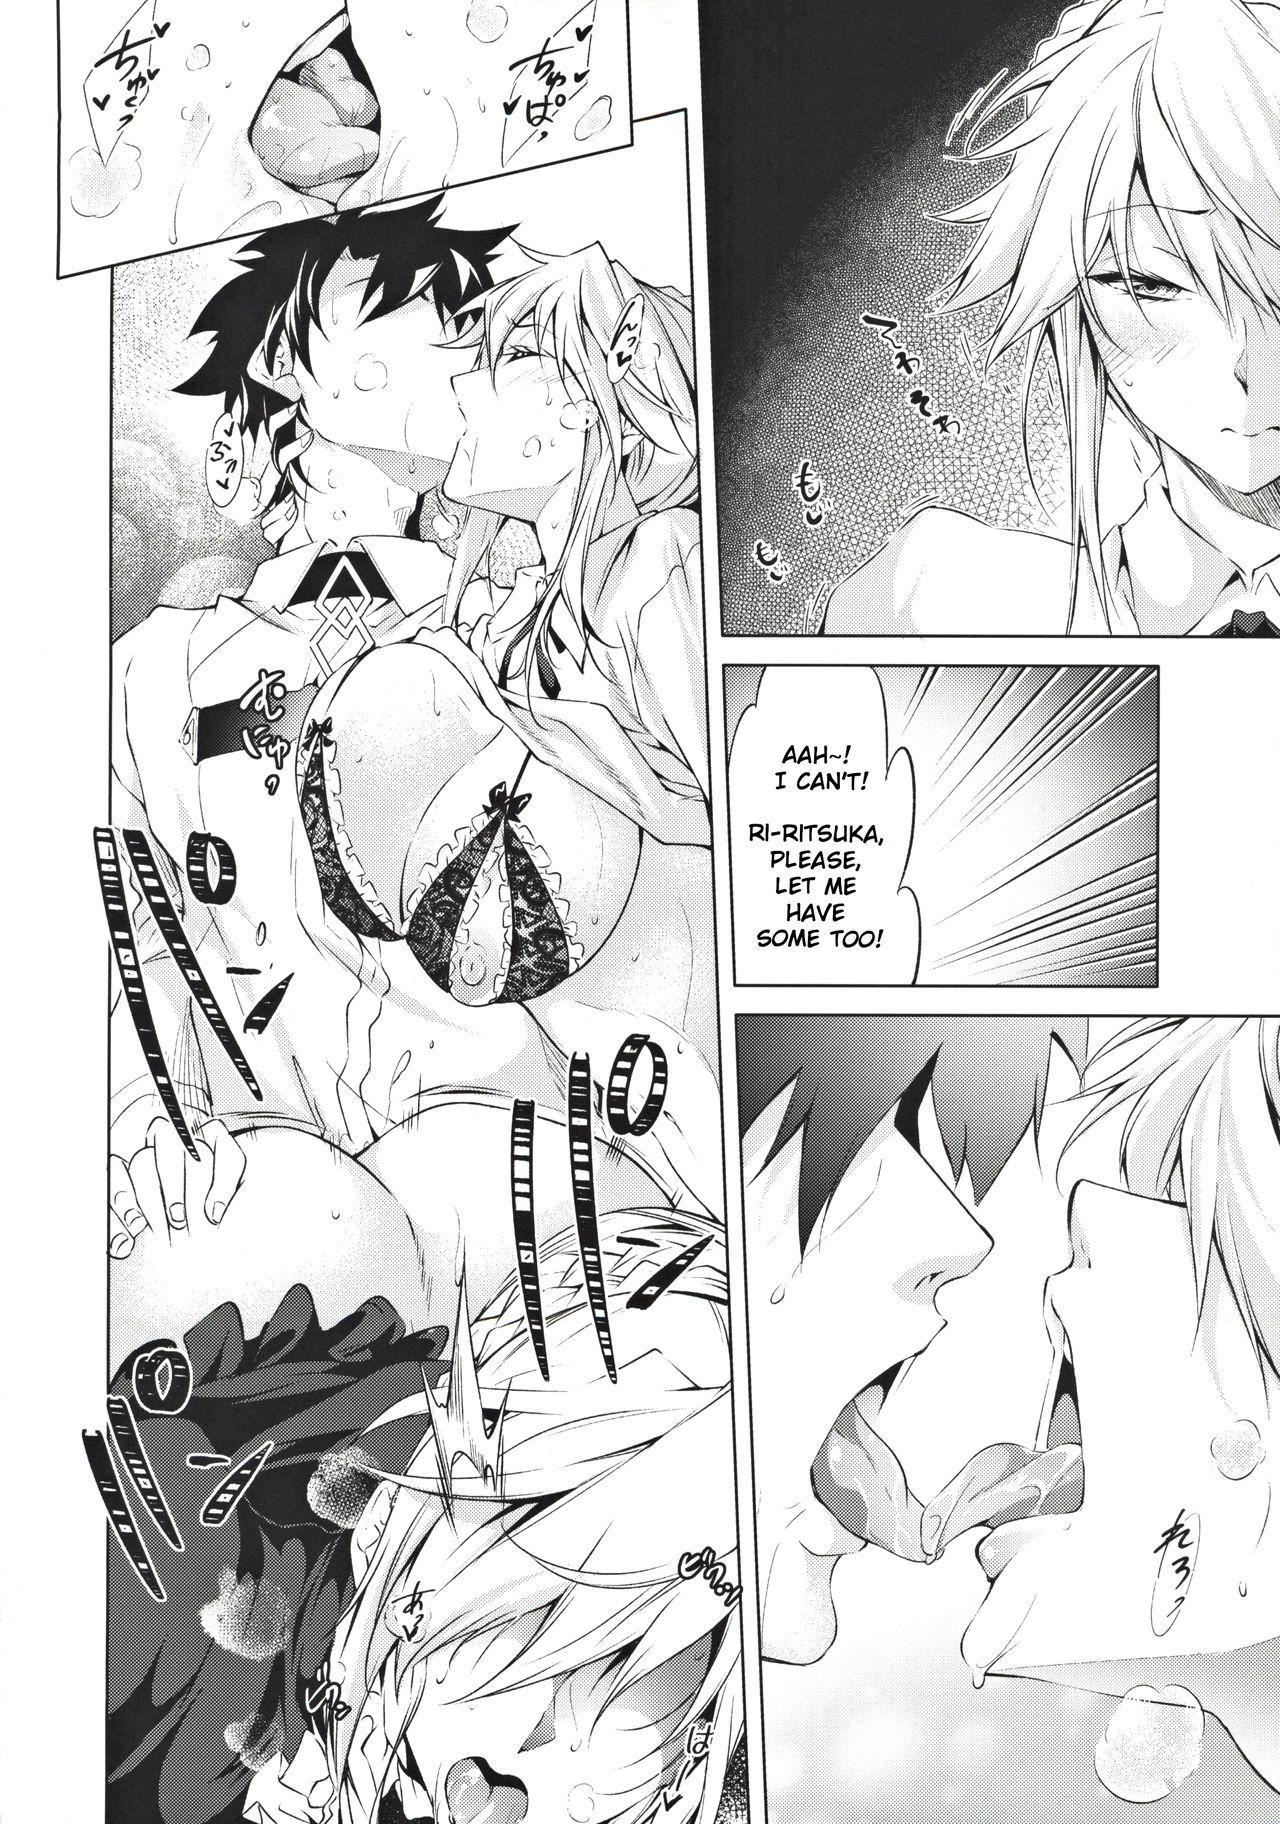 Pendra Shimai no Seijijou   The Pendragon twin sisters' sexual situation 12